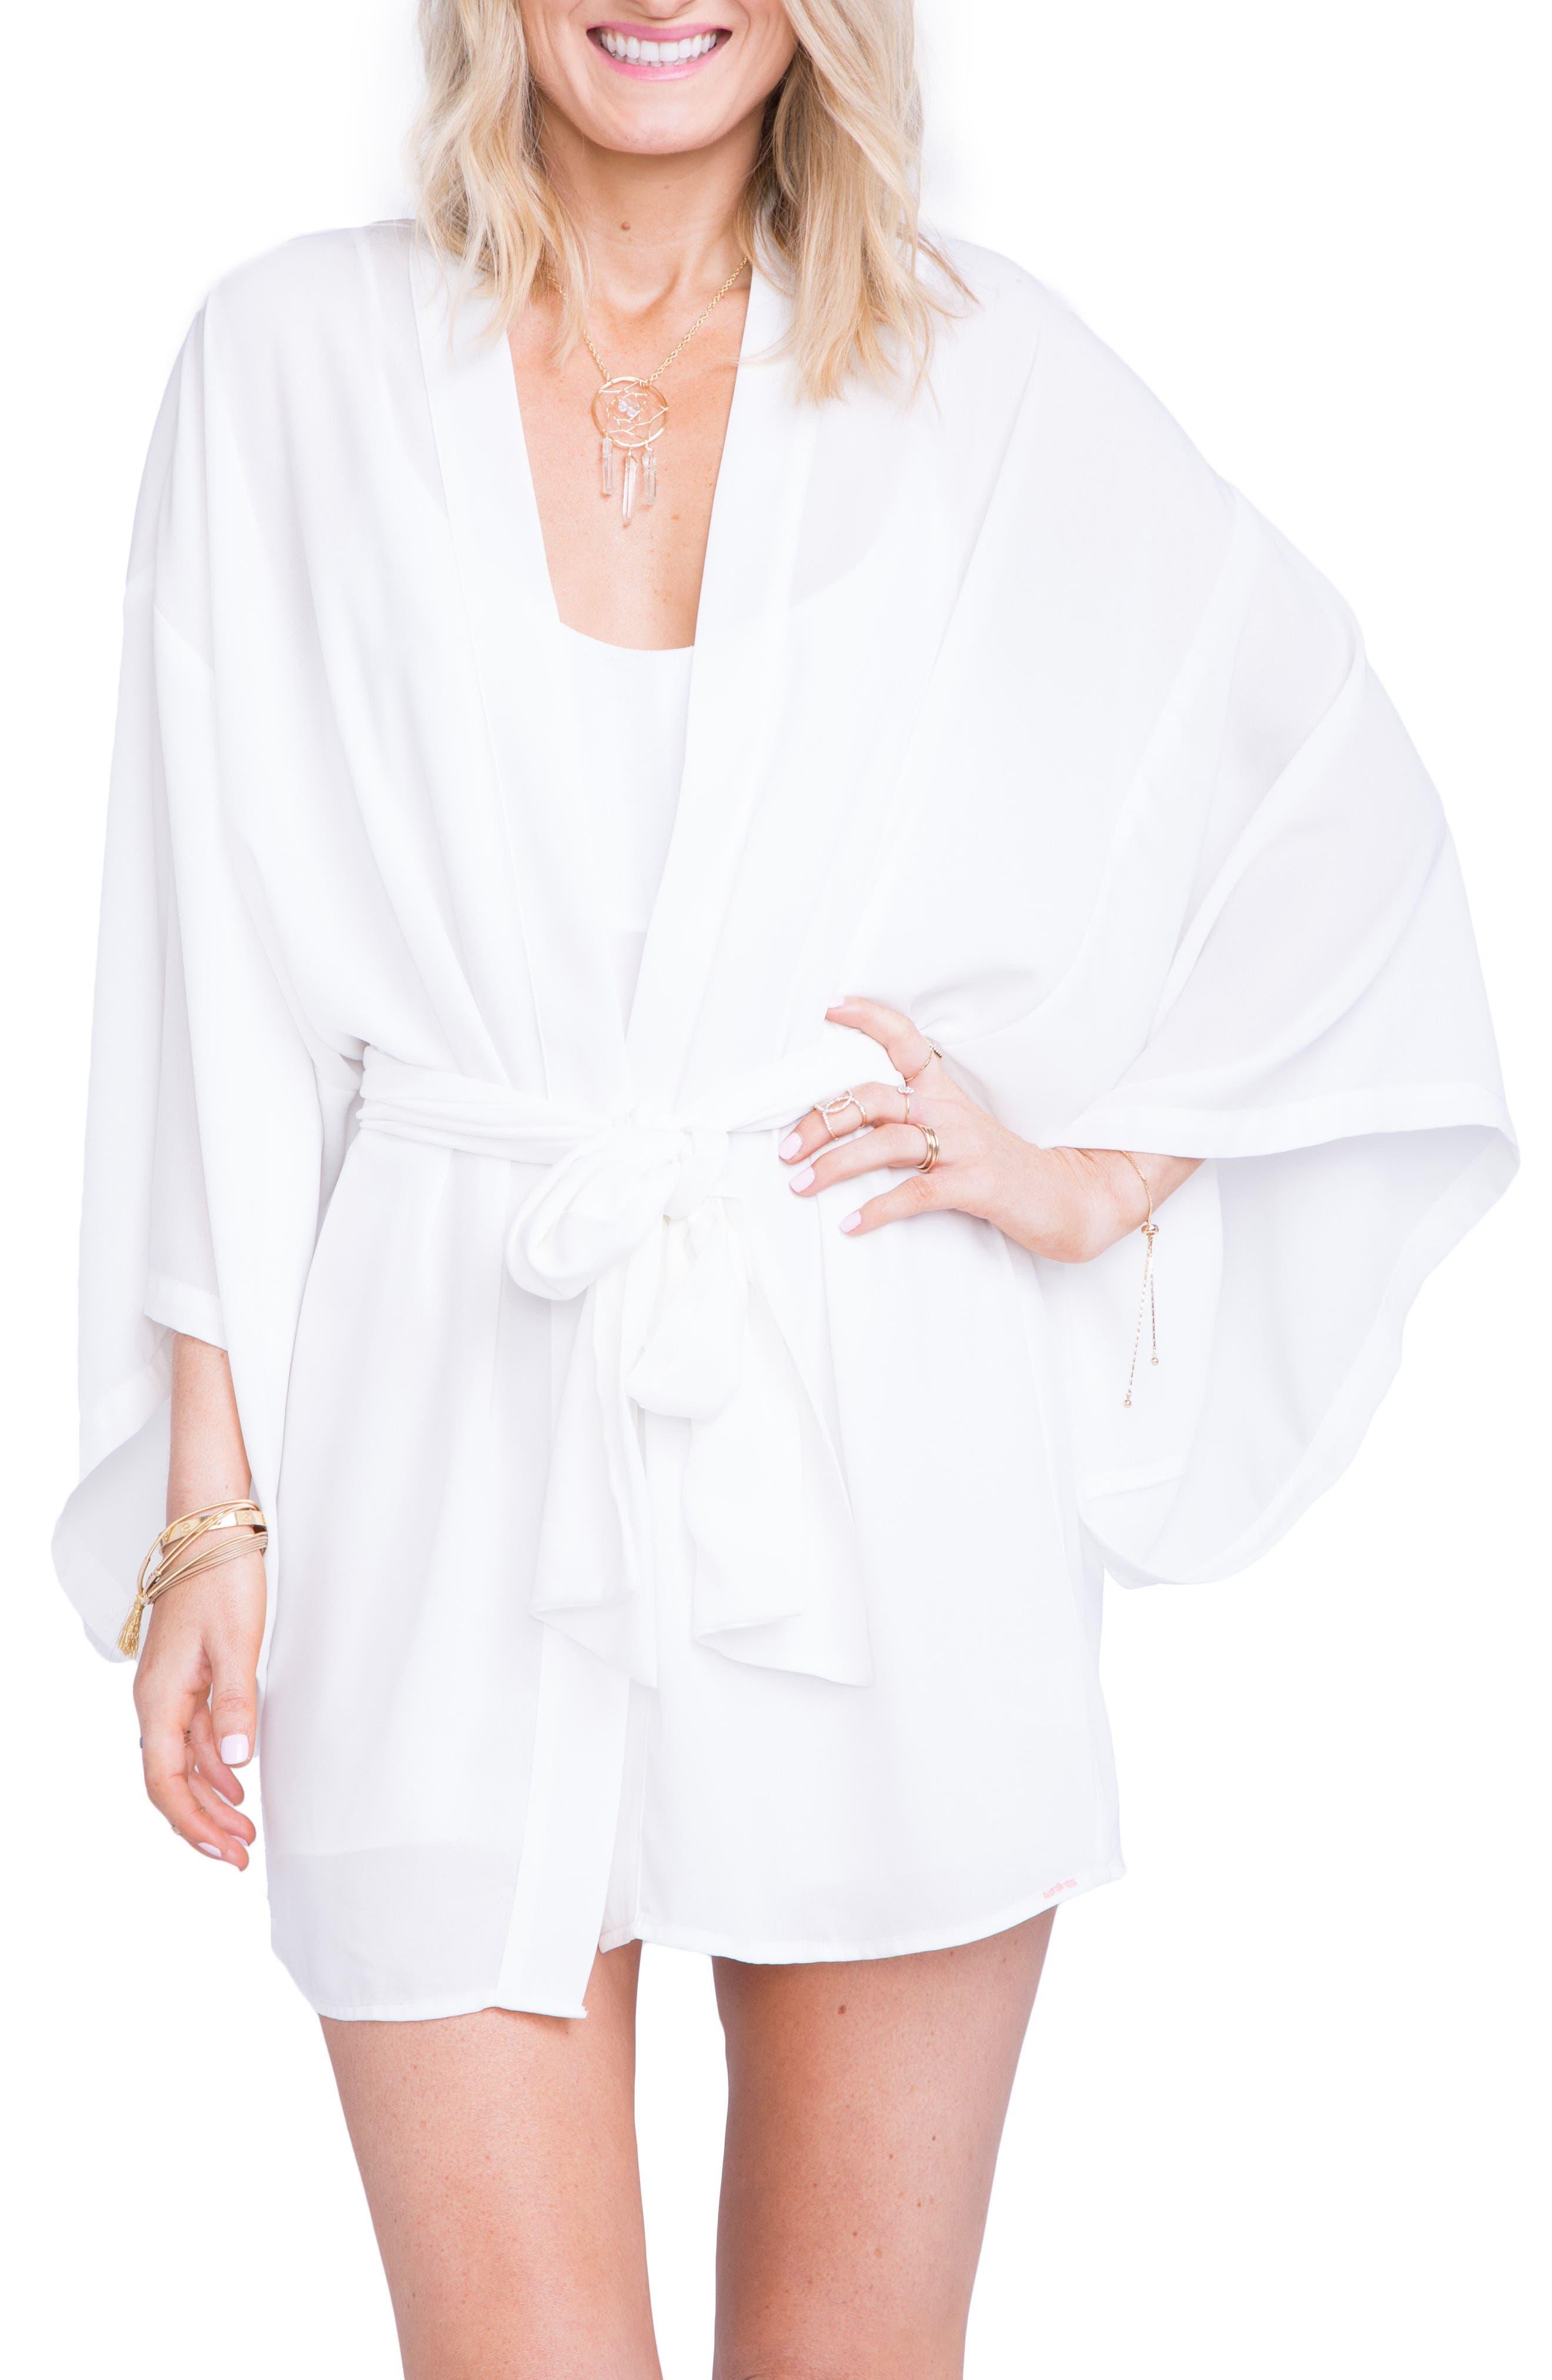 Alternate Image 1 Selected - Show Me Your Mumu 'Texas' Kimono